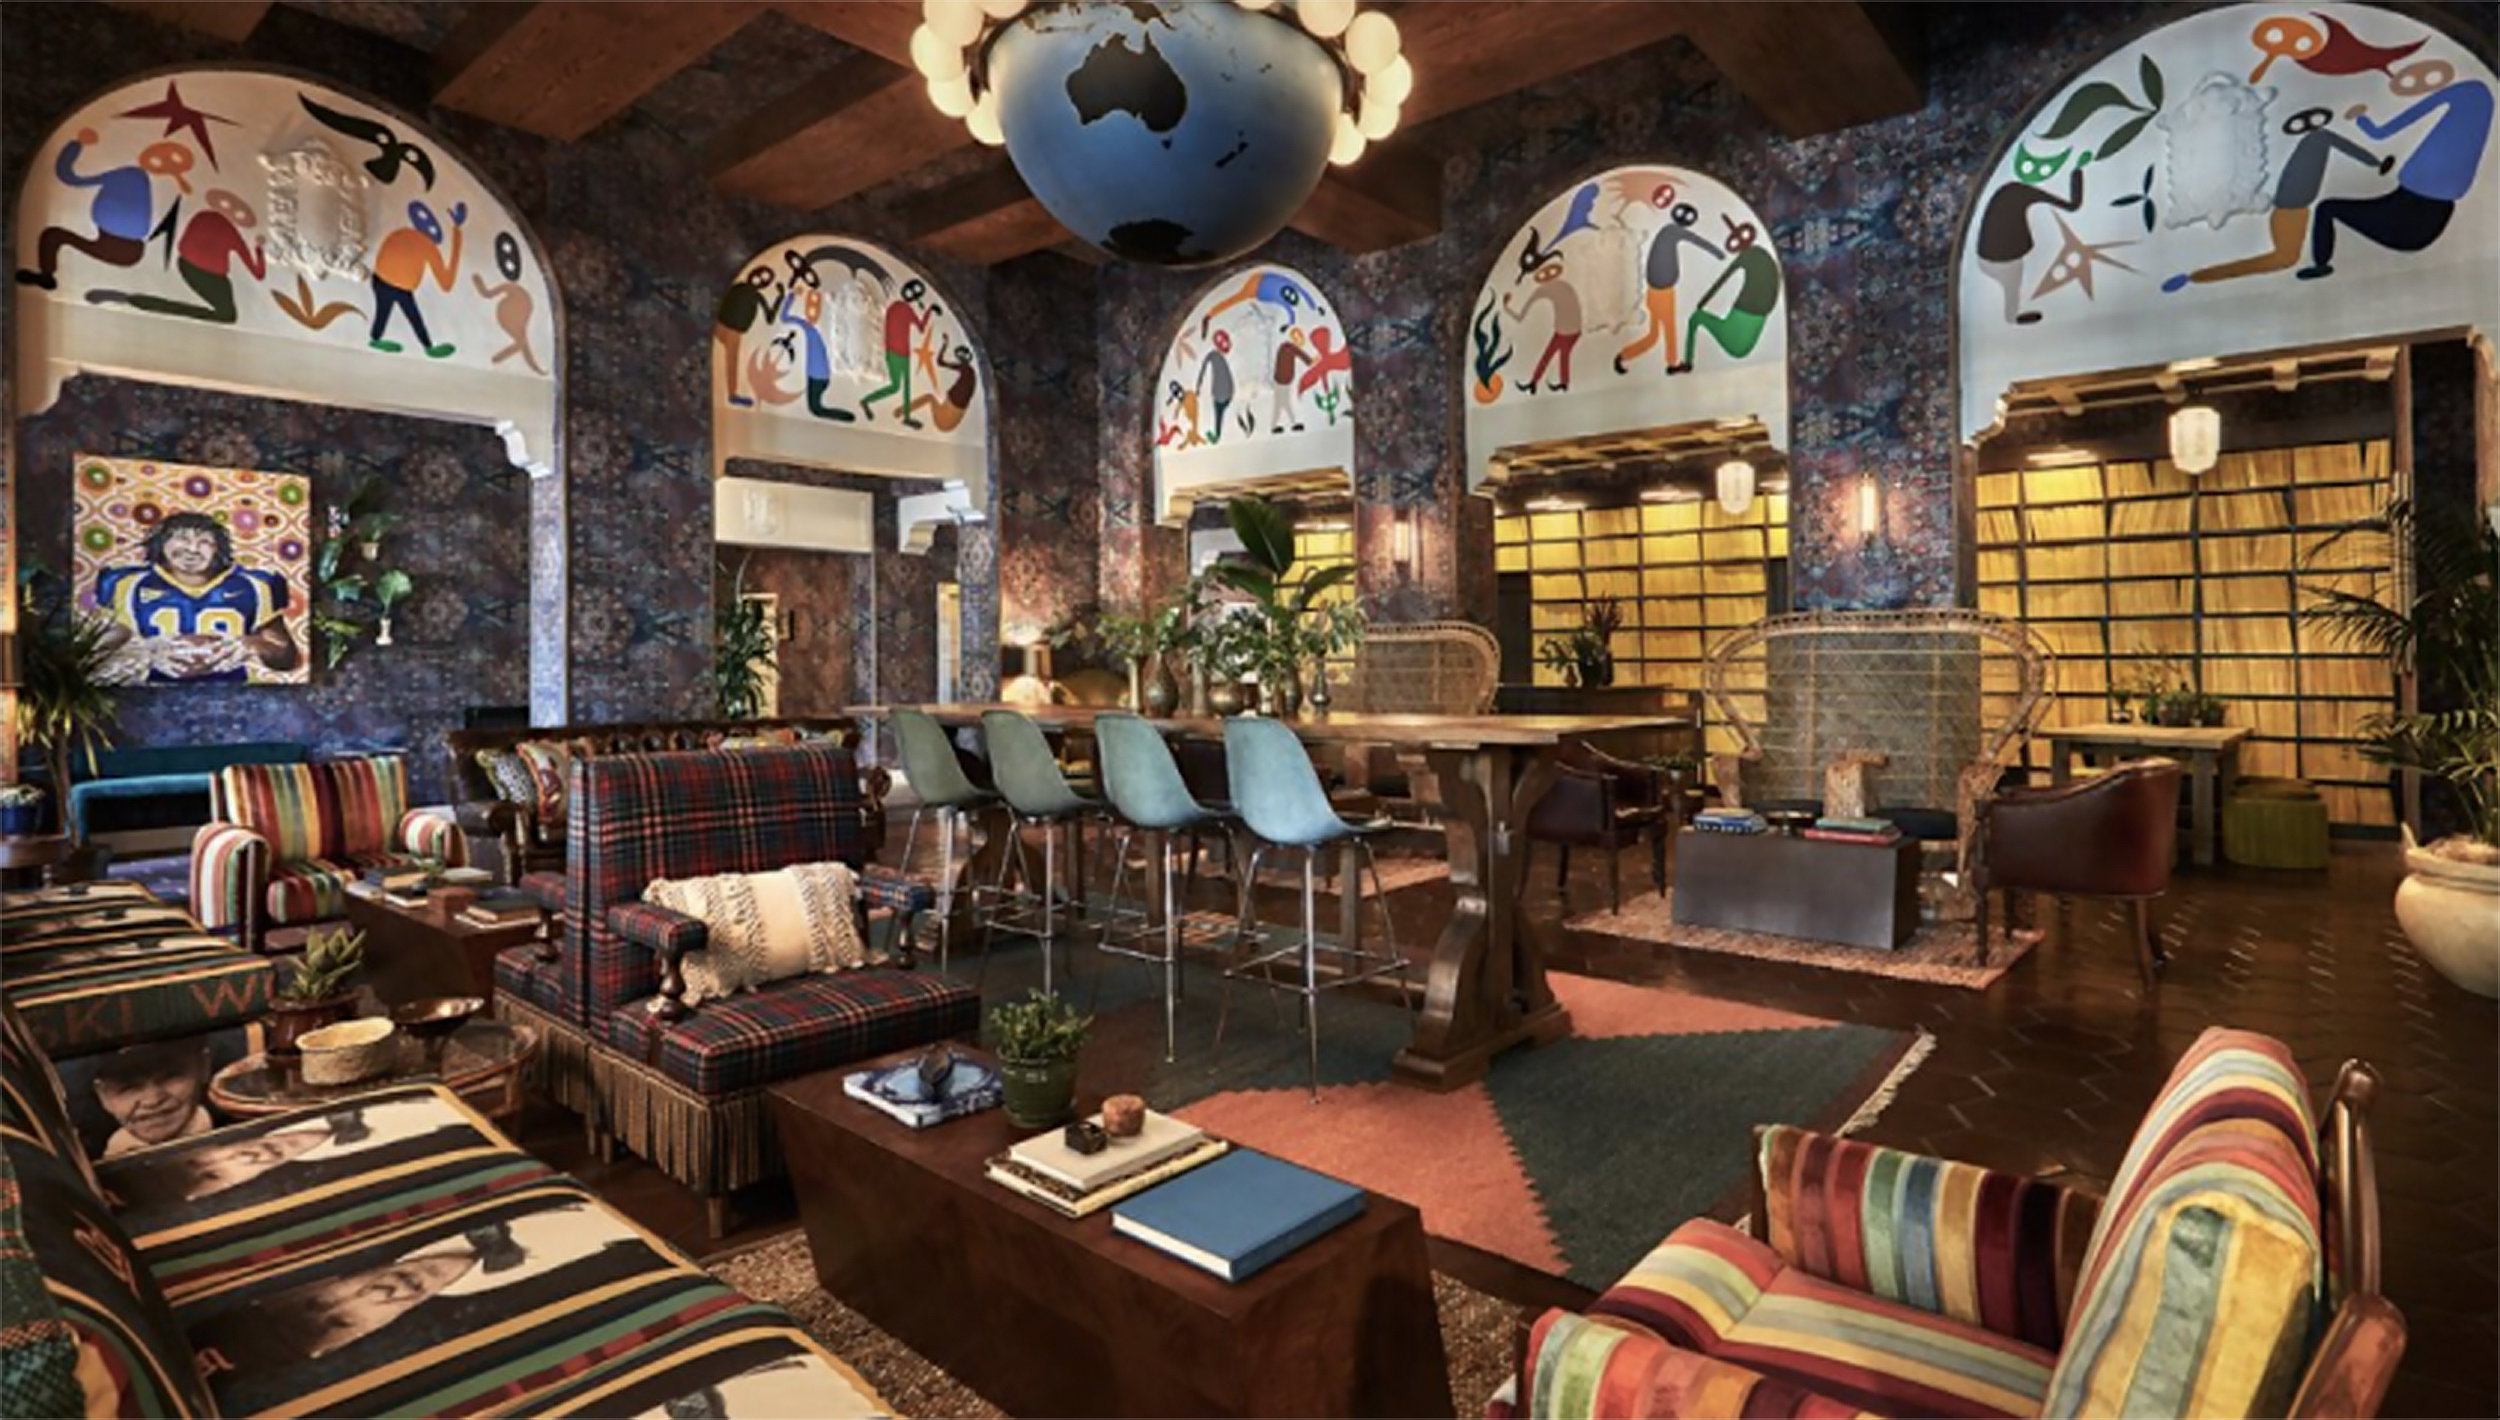 Studio Herron rug designed for the lobby of the Graduate Hotel in Berkeley, CA.